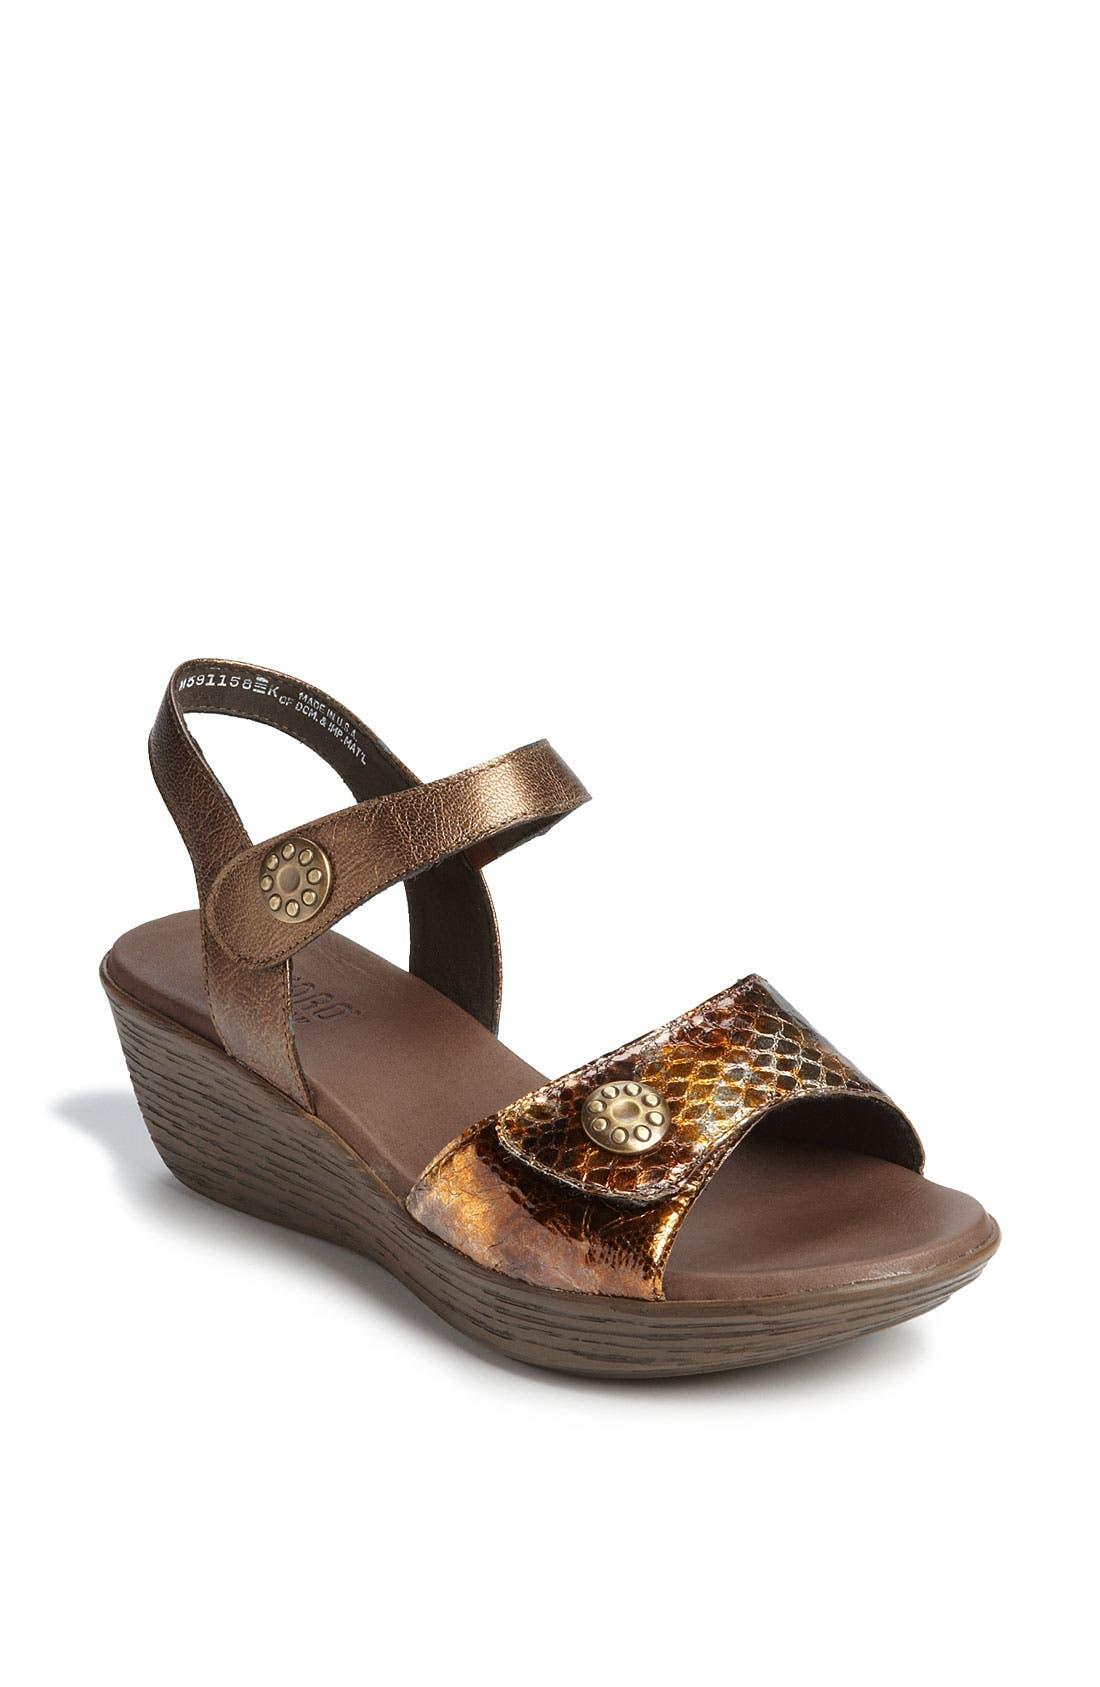 Alternate Image 1 Selected - Munro 'Tyra' Sandal